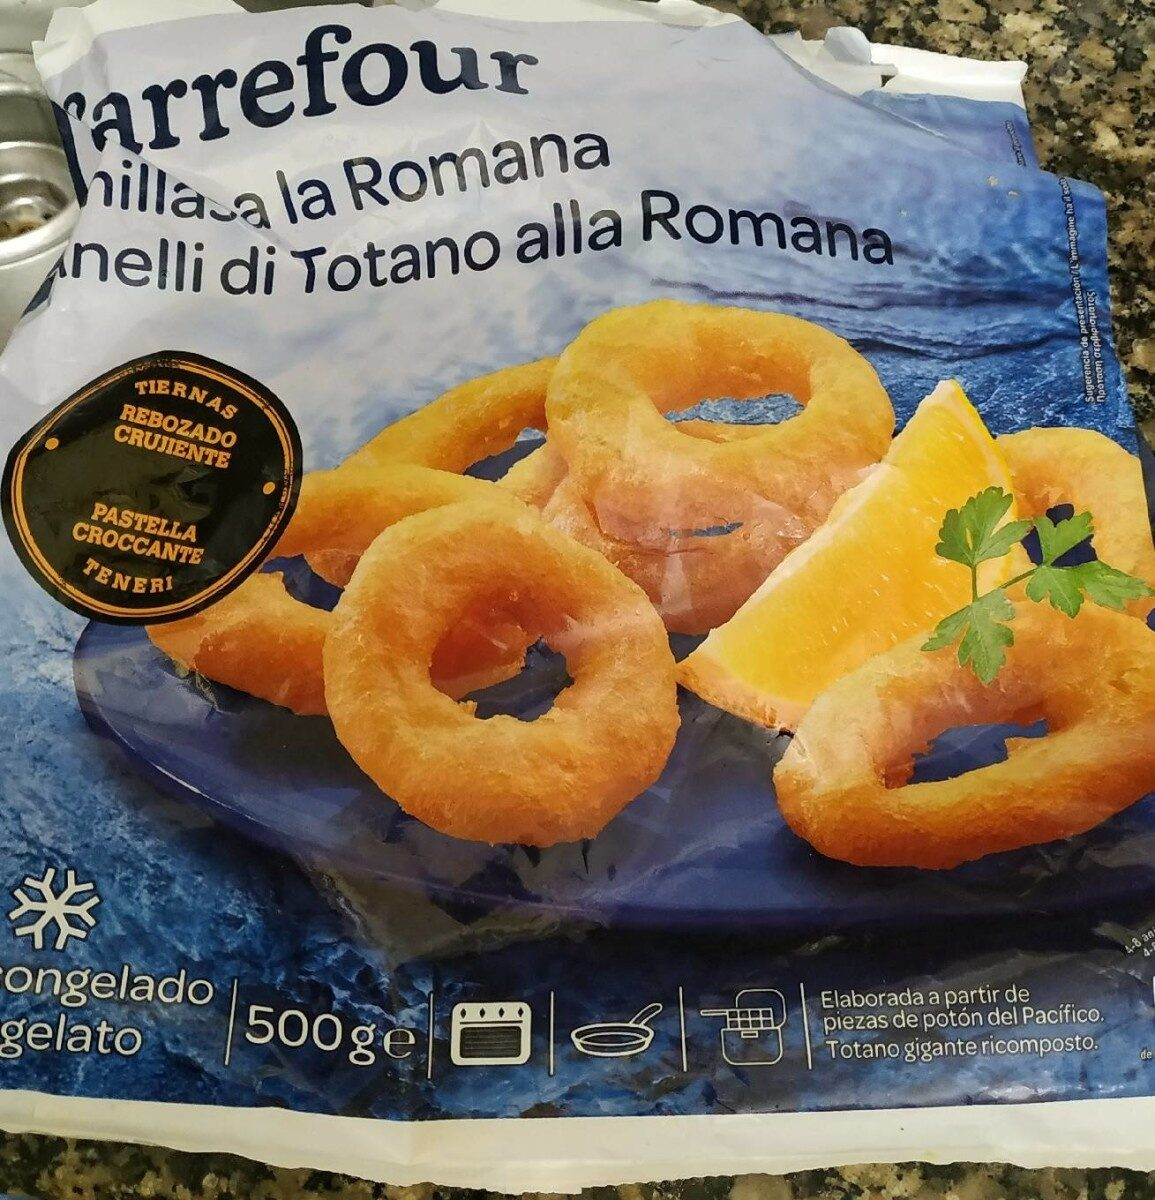 Anillas a la romana - Product